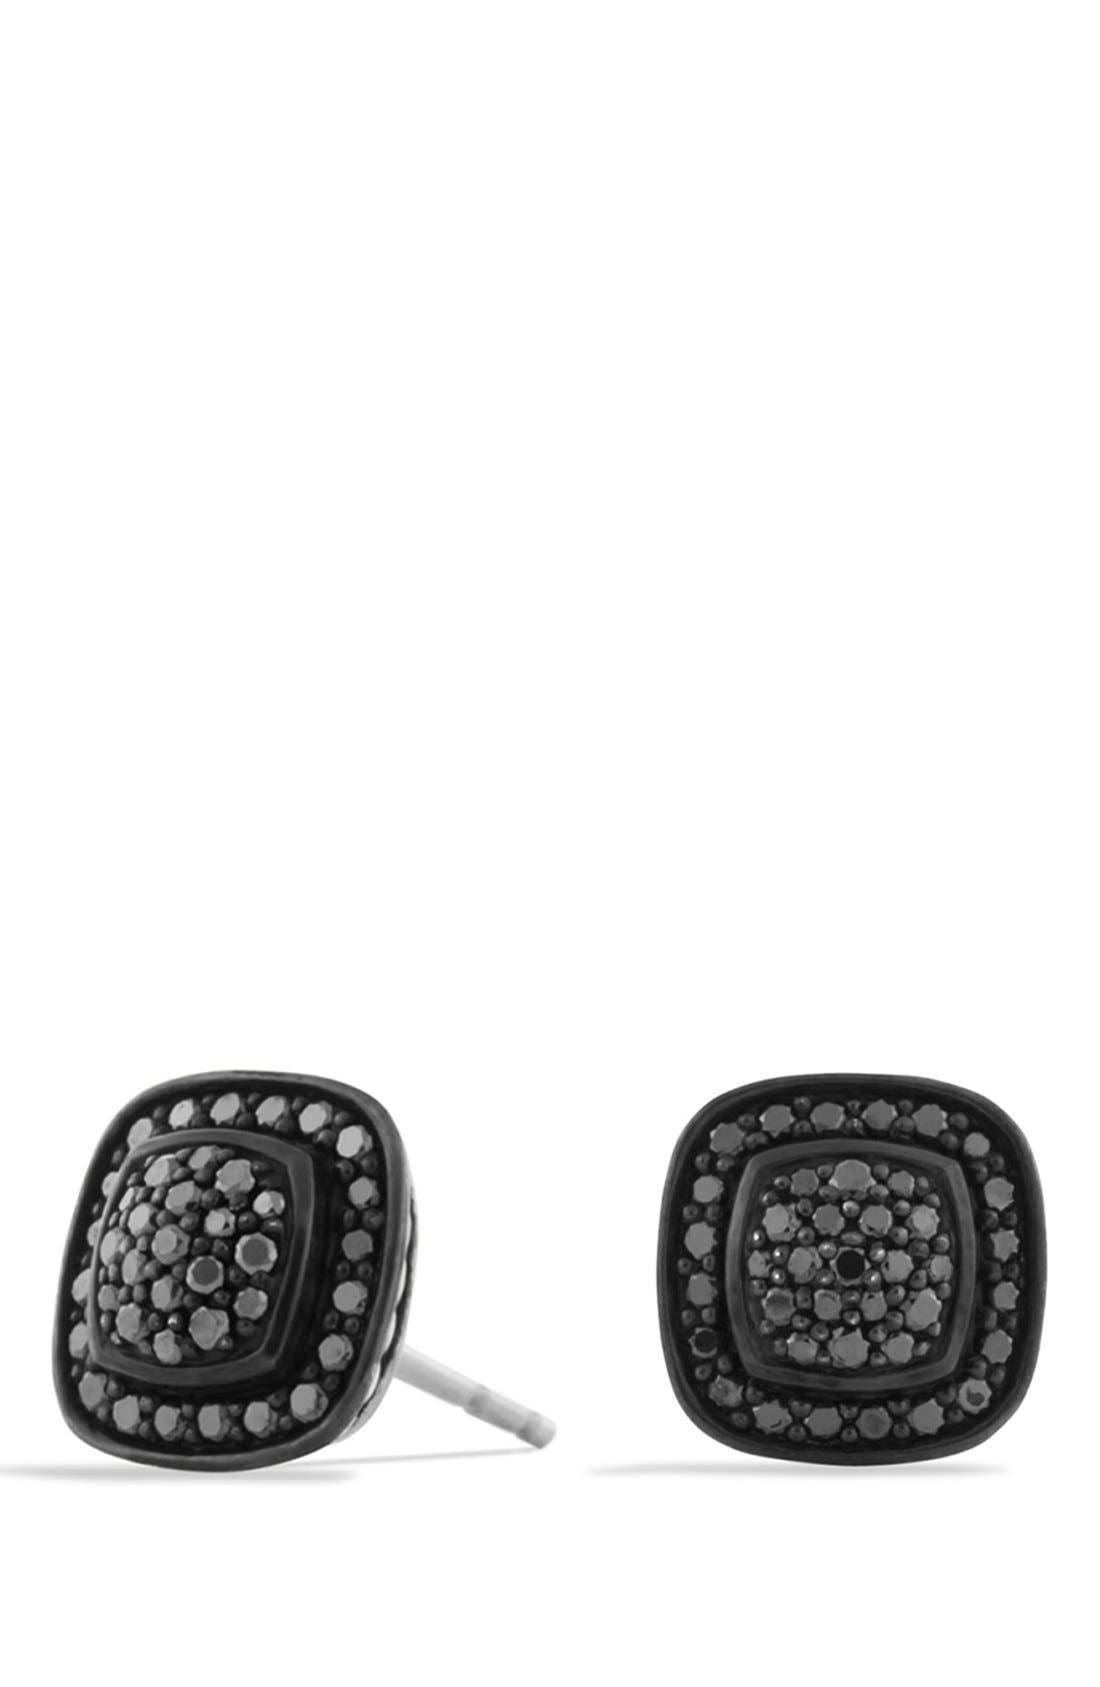 DAVID YURMAN Albion Petite Earrings with Black Diamonds